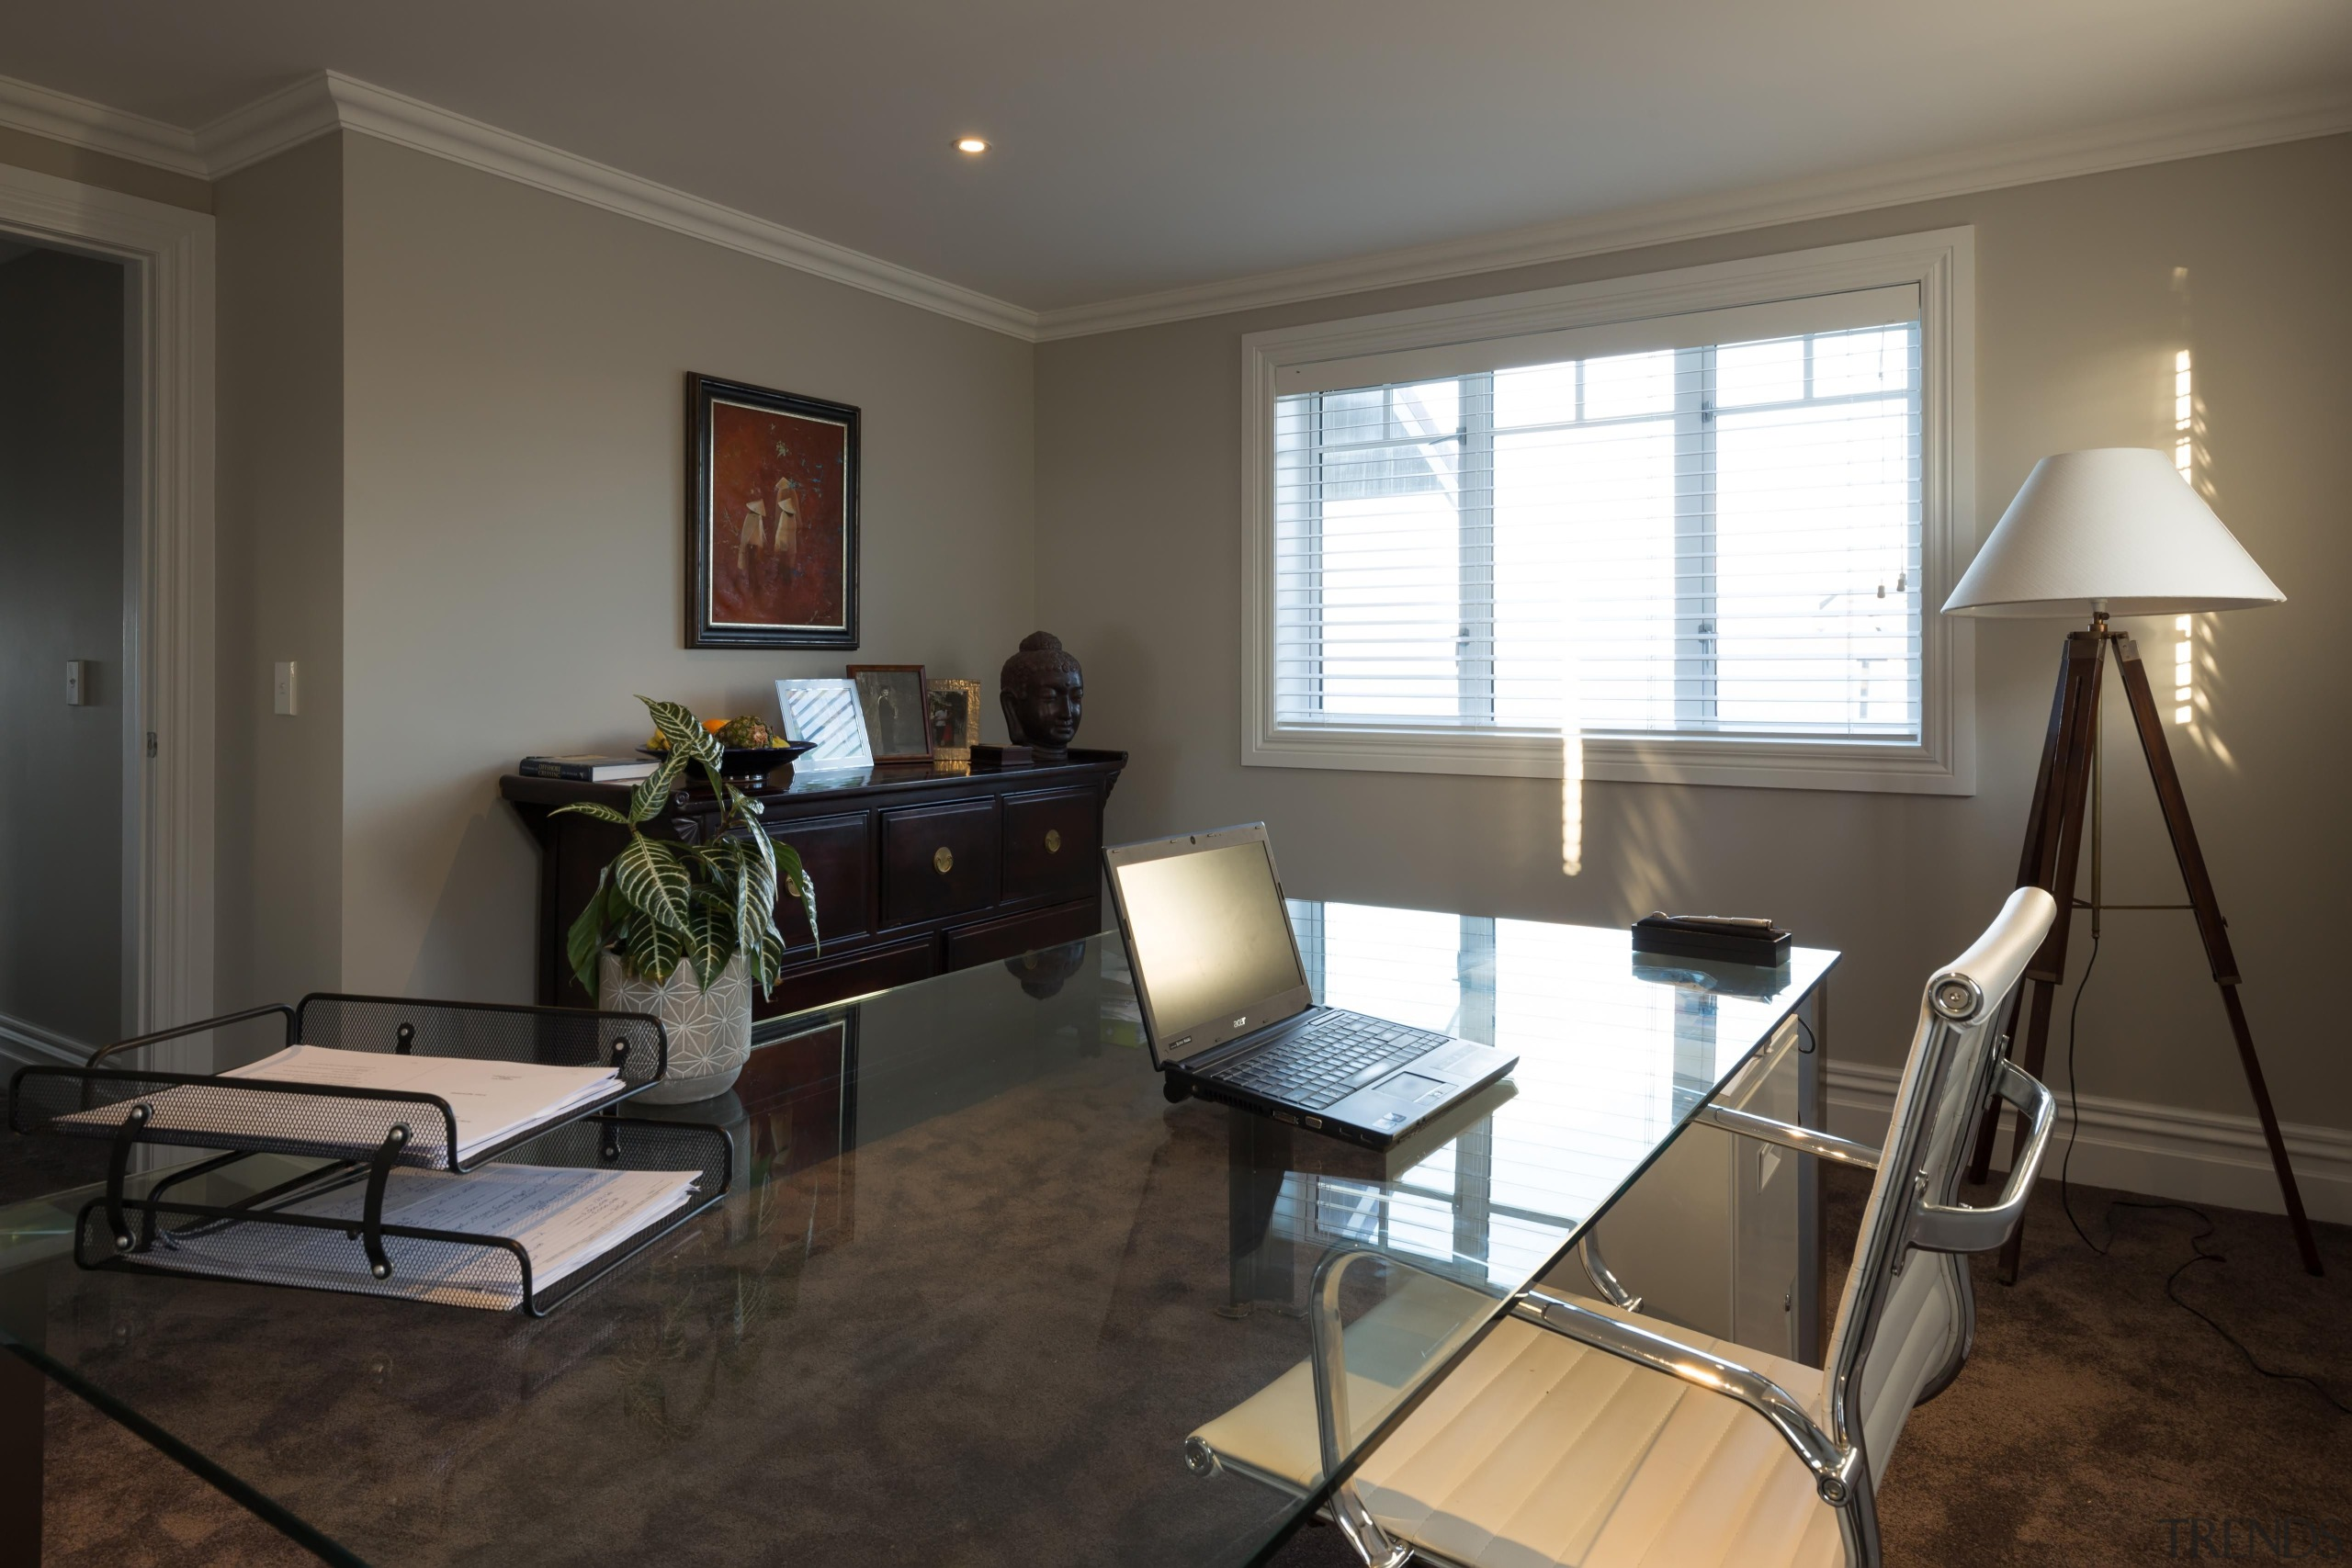 12 office after - Office After - floor floor, flooring, home, interior design, living room, real estate, room, black, gray